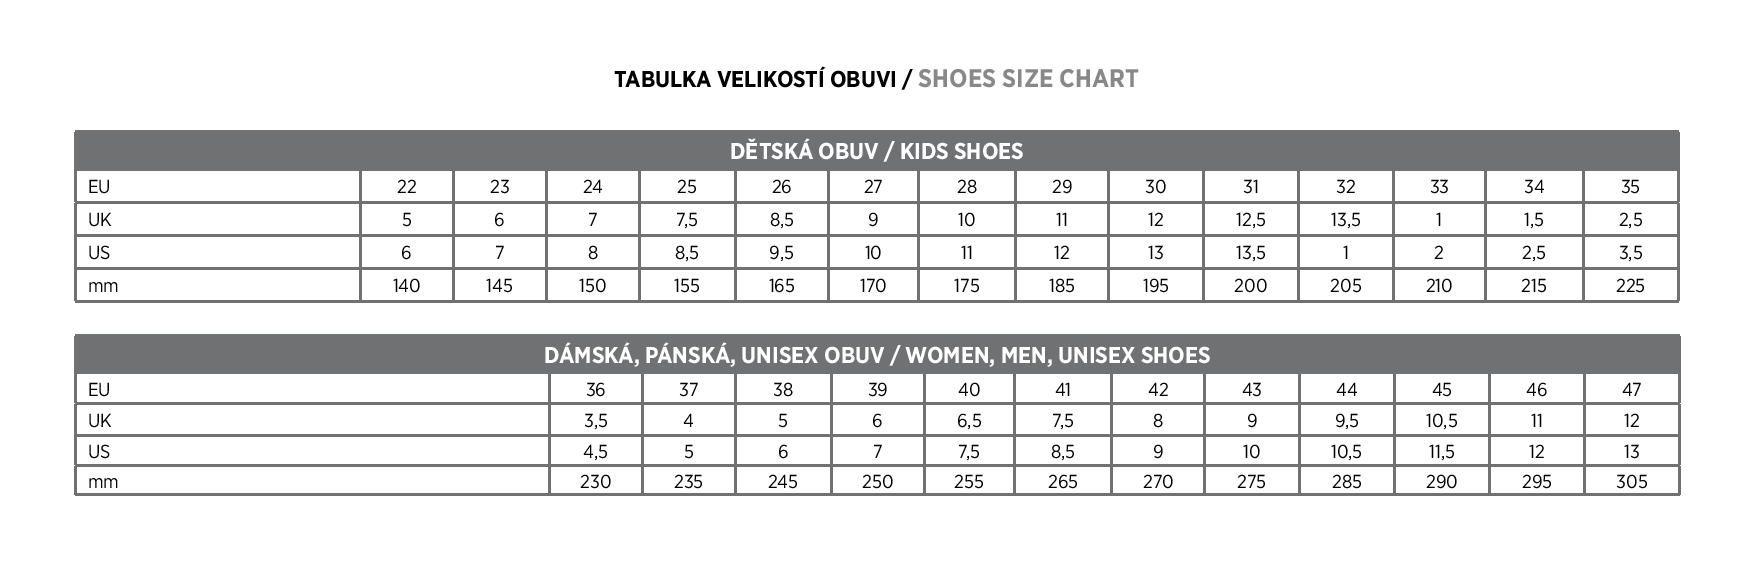 Velikostní tabulka obuvi